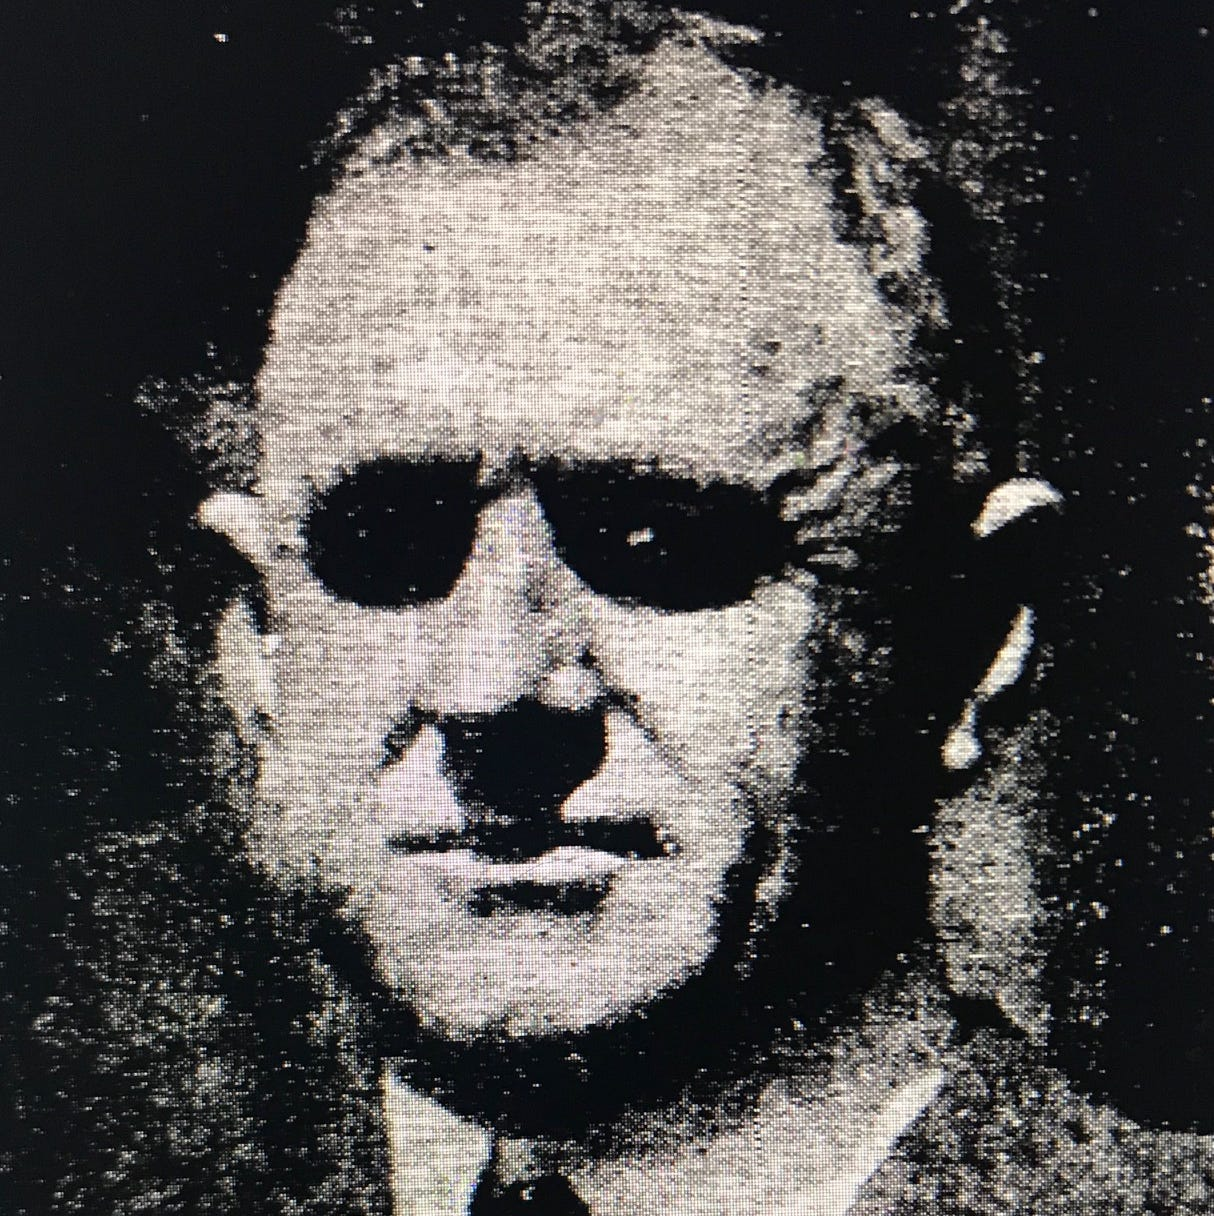 This former Evansville mayor was in the KKK | Webb